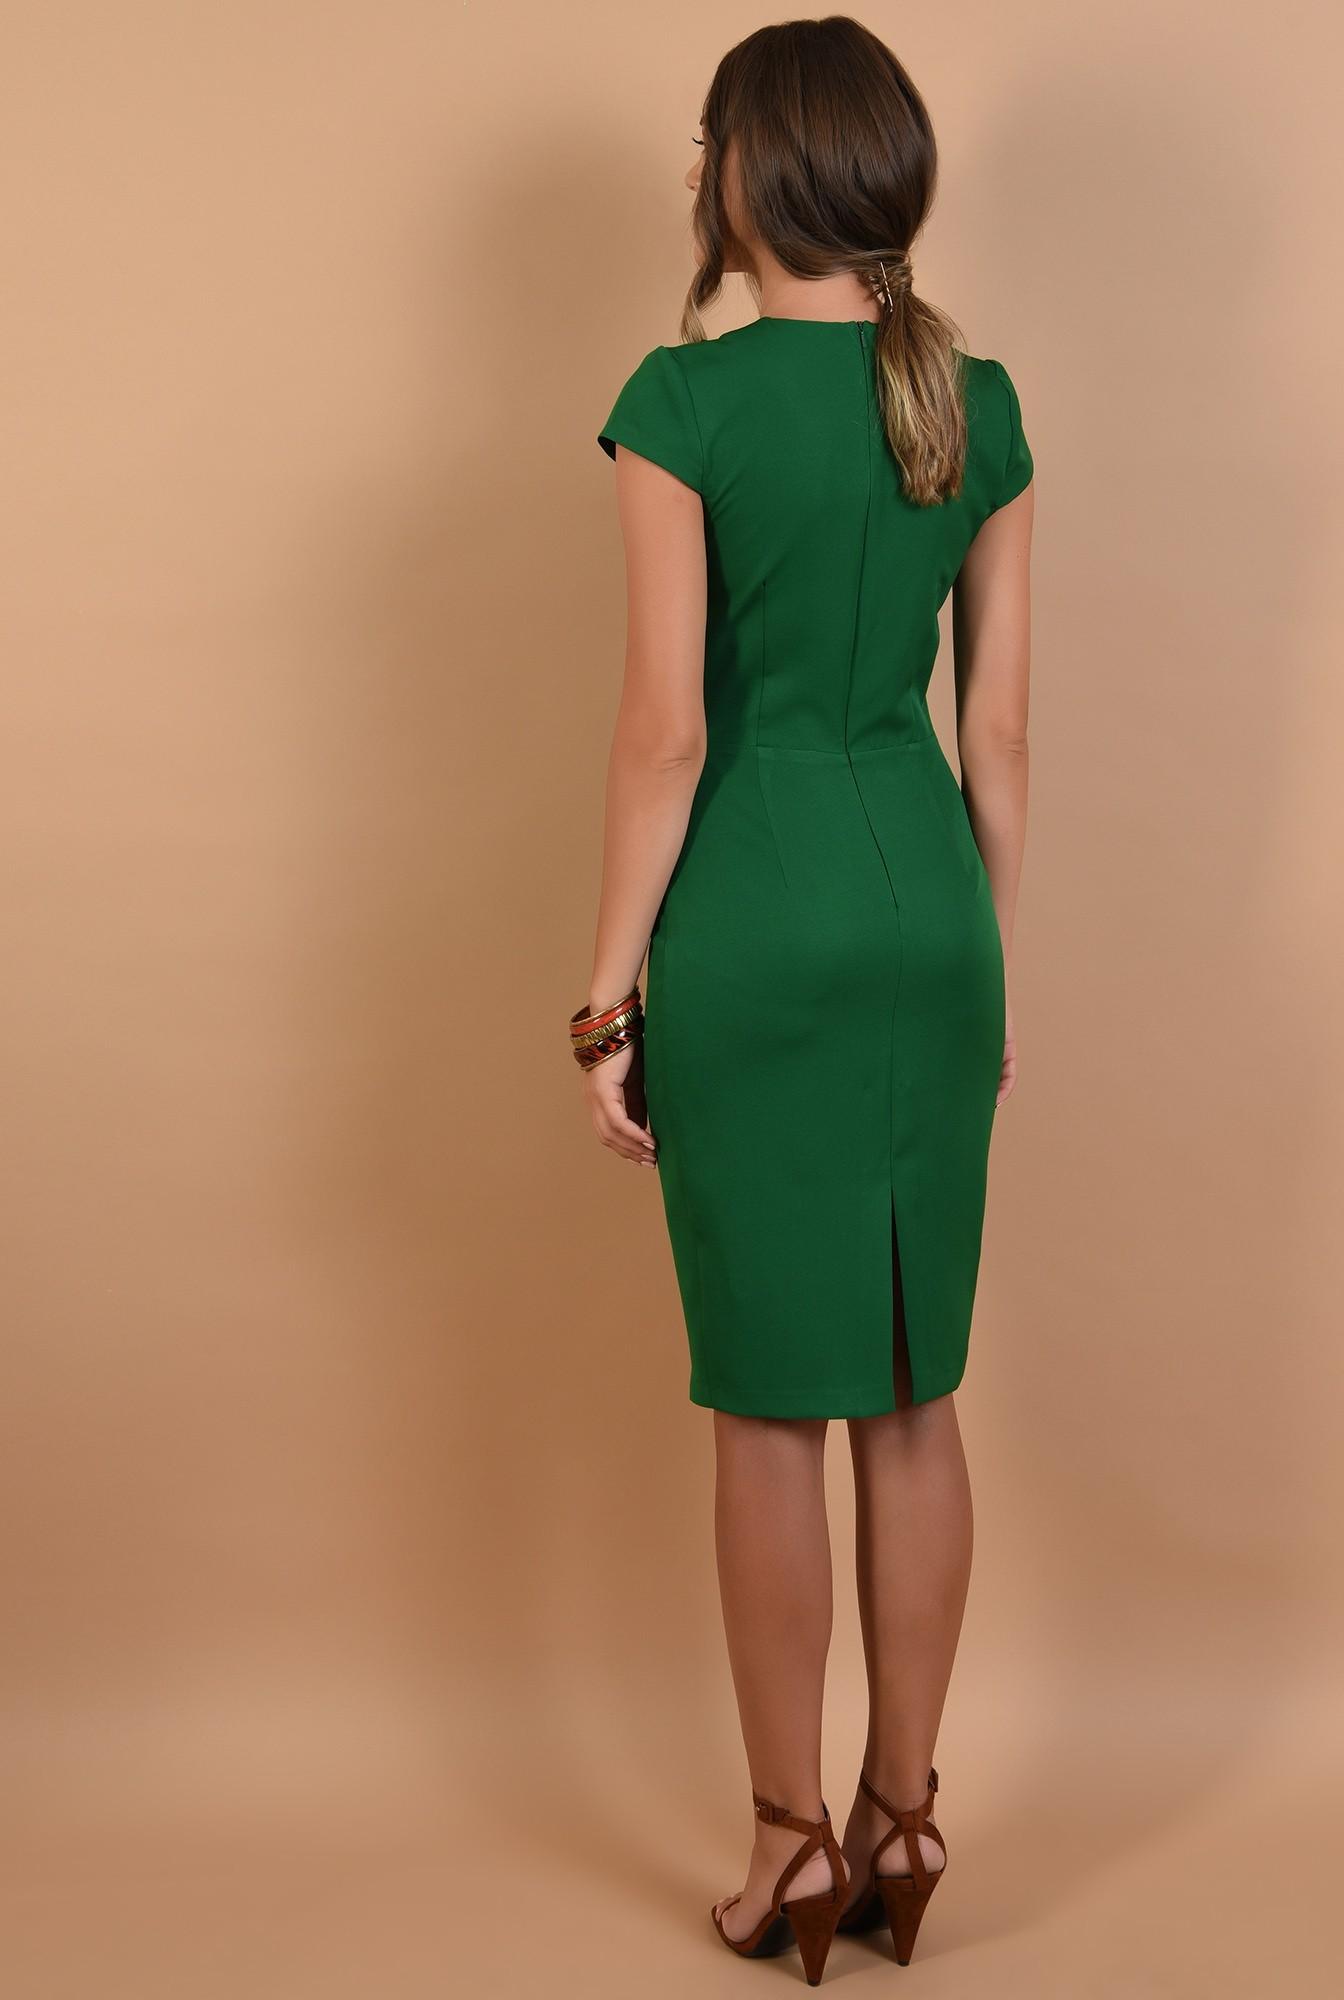 1 - rochie verde, office, conica, midi, cu maneci capac, cusaturi decorative, Poema